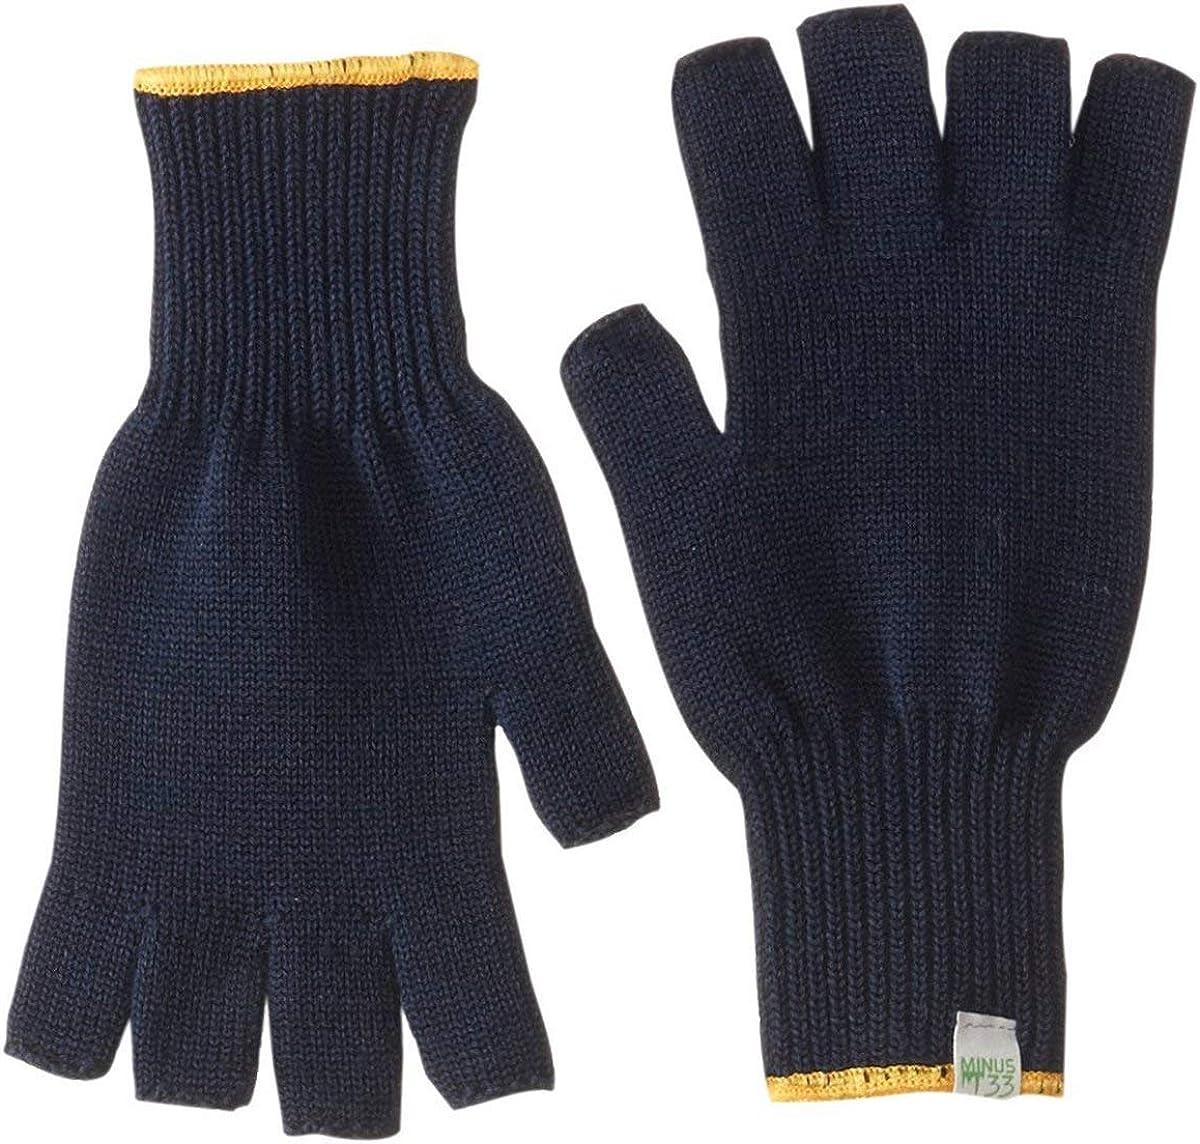 Minus33 Merino Wool 6610 Fingerless Glove Liner: Clothing